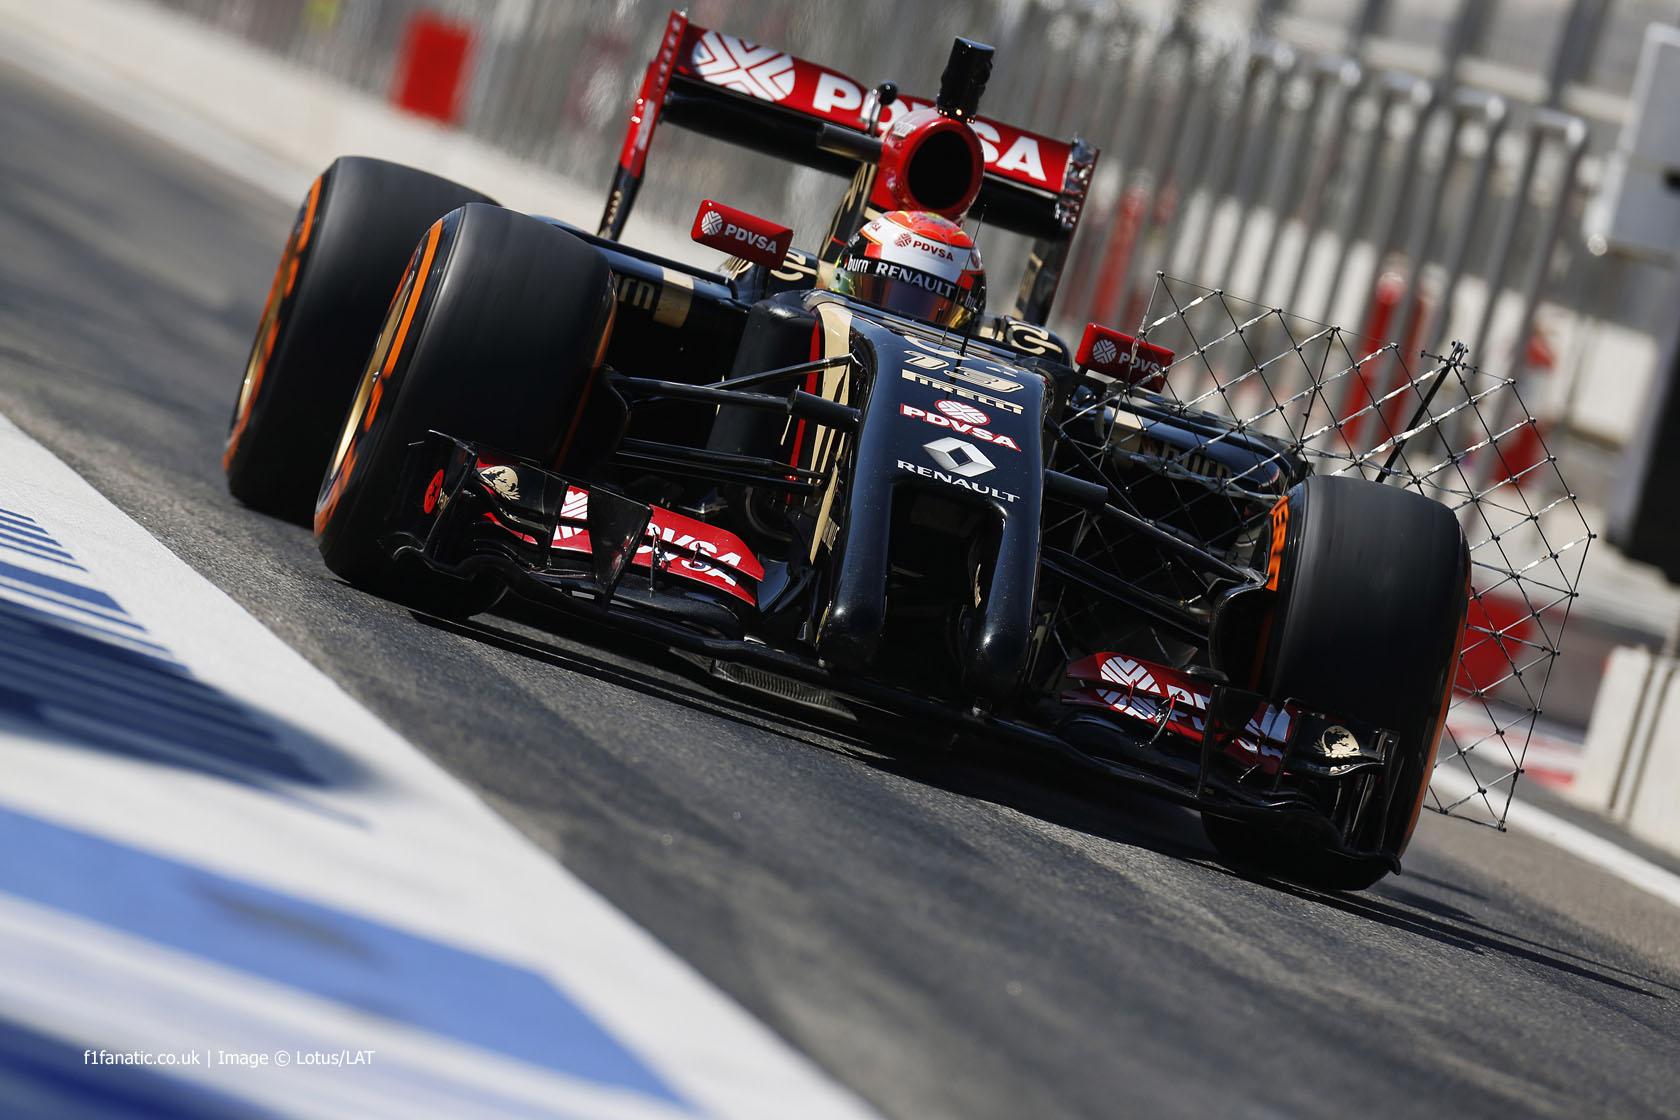 Pastor Maldonado, Lotus, Bahrain International Circuit, 2014